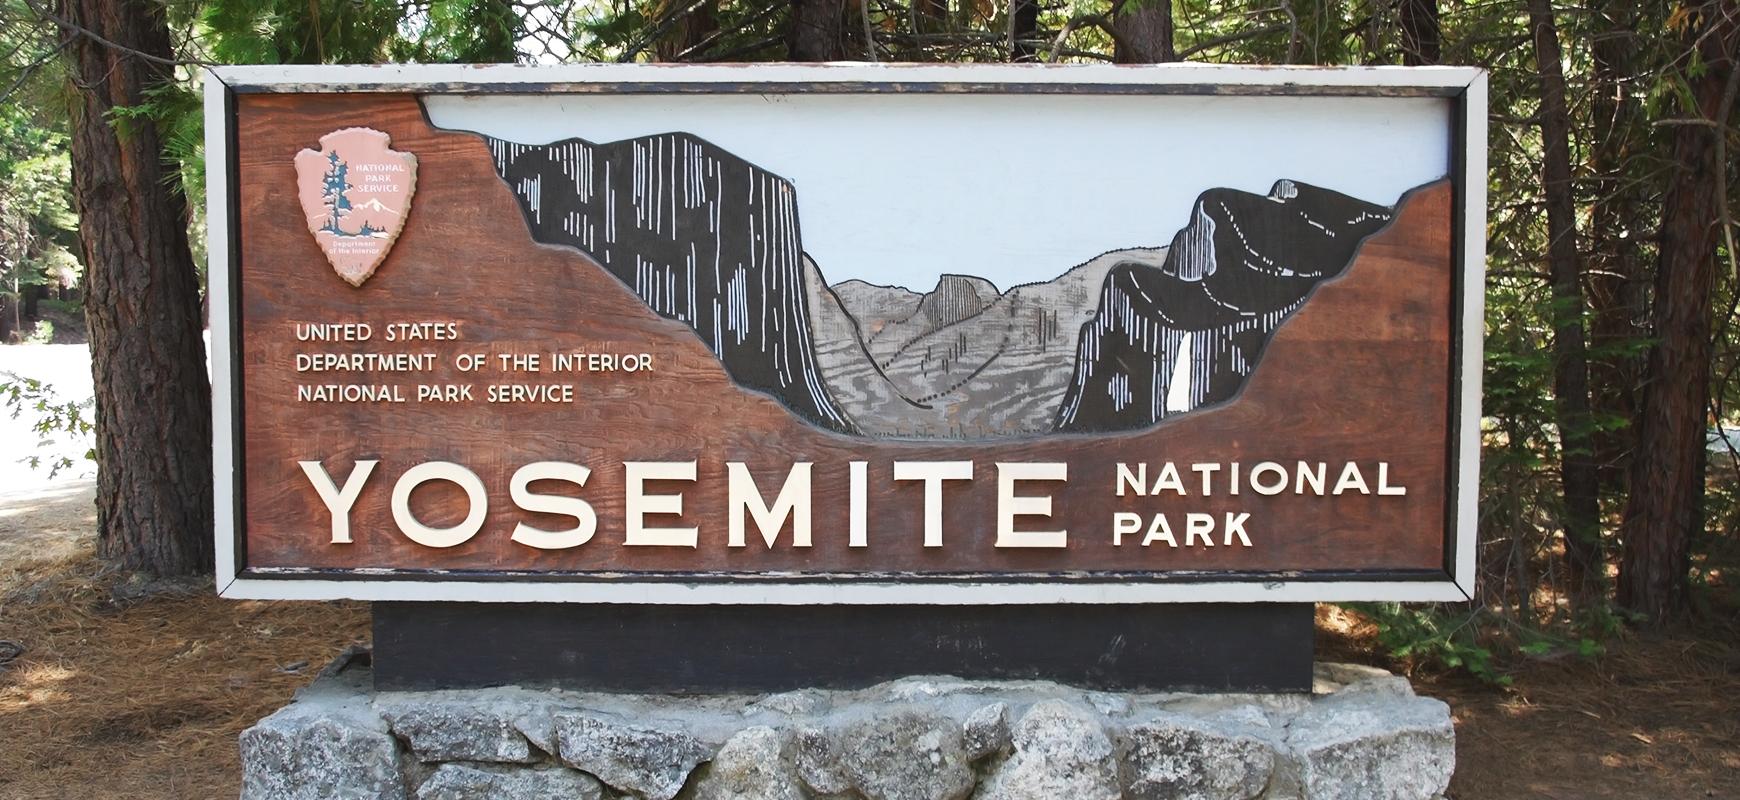 bespoke monument sign